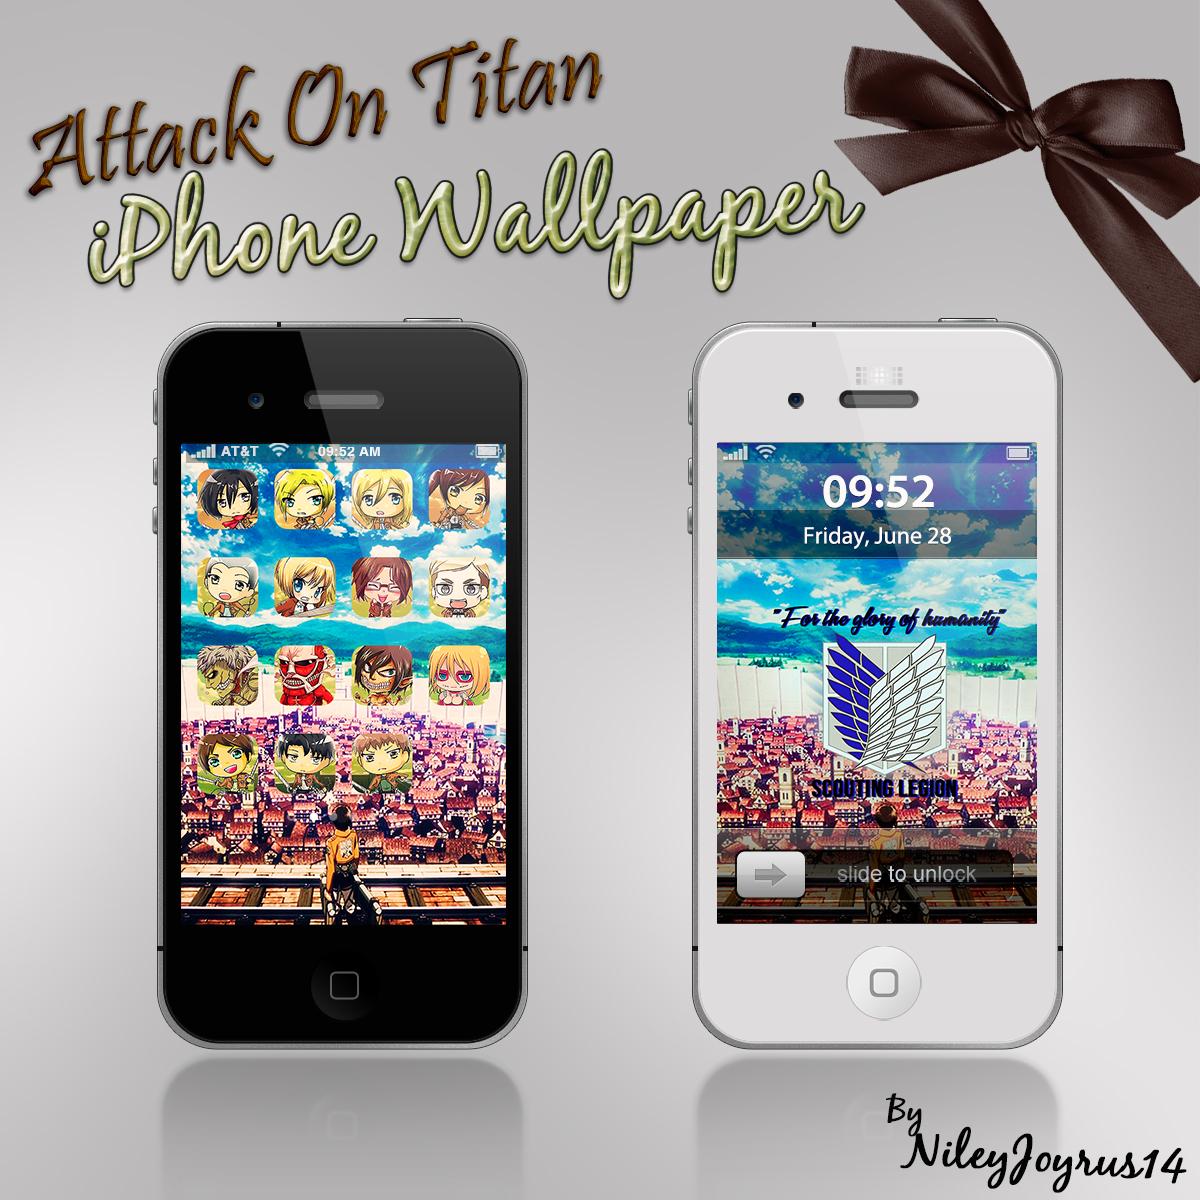 Demon slayer kimetsu no yaiba phone wallpapers wallpaper cave. iPhone Wallpaper - Attack On Titan 01 by NileyJoyrus14 on ...